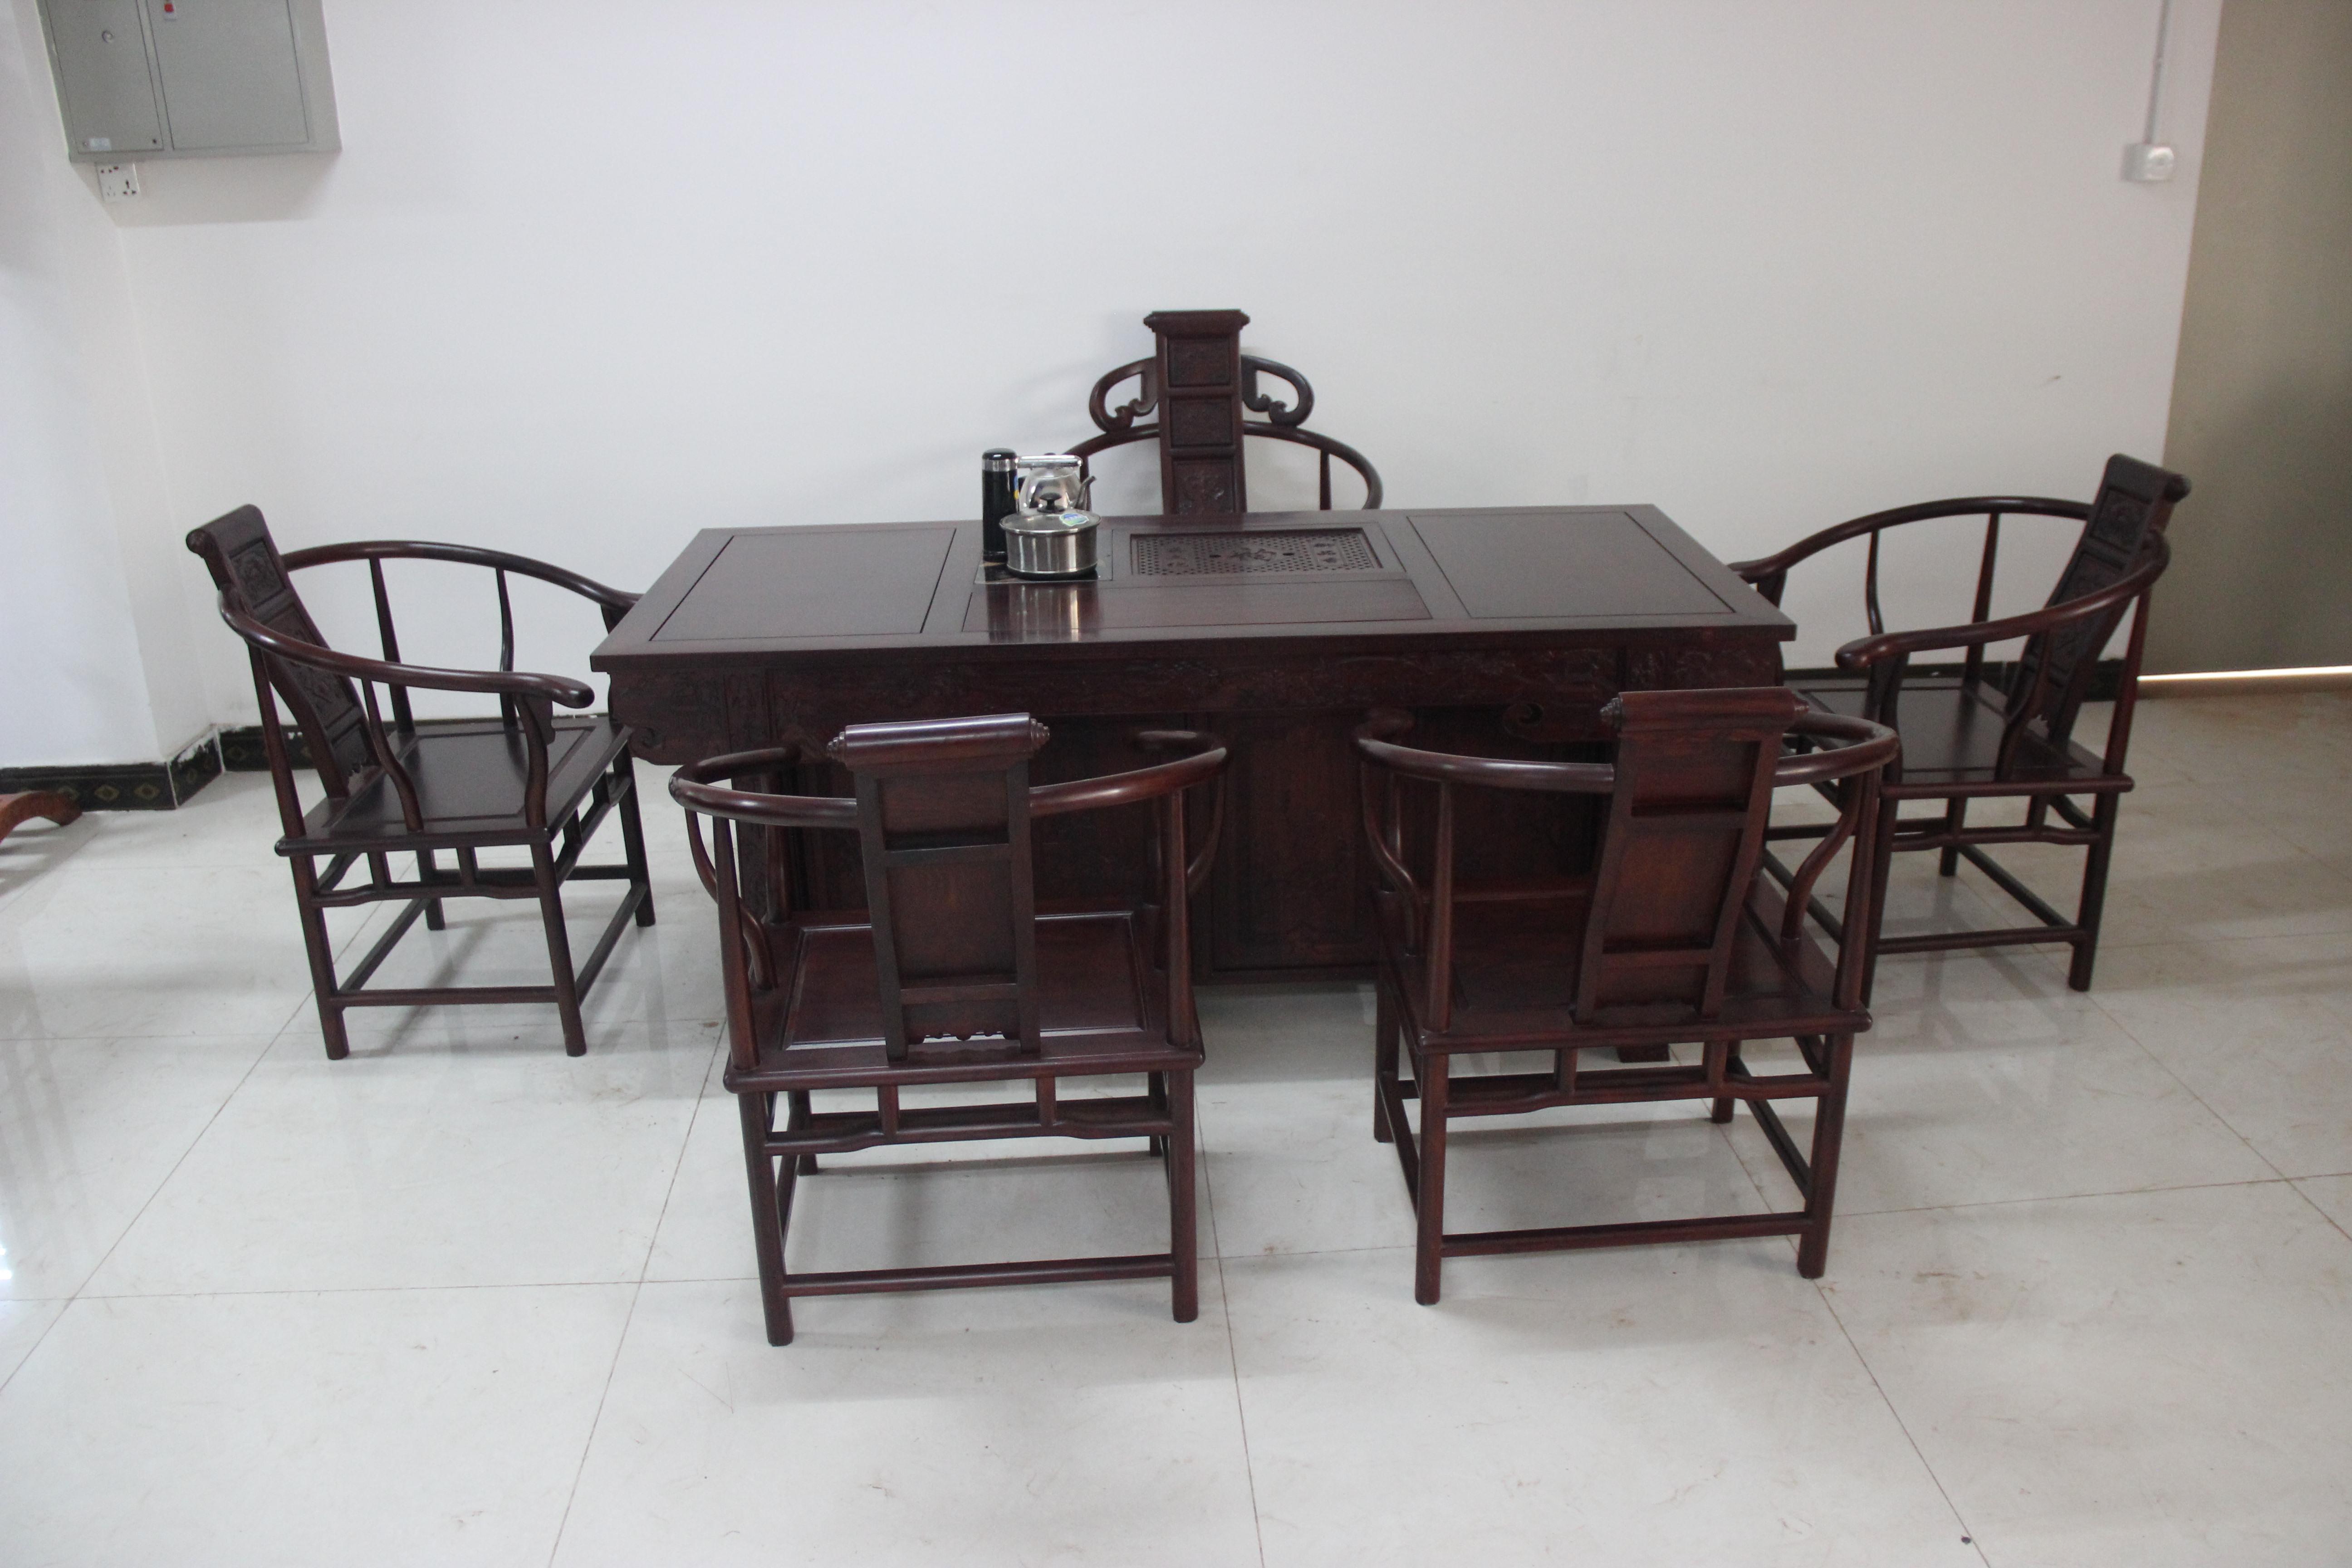 qq餐厅餐桌怎么取消_餐厅 餐桌 茶几 家具 装修 桌 桌椅 桌子 5184_3456